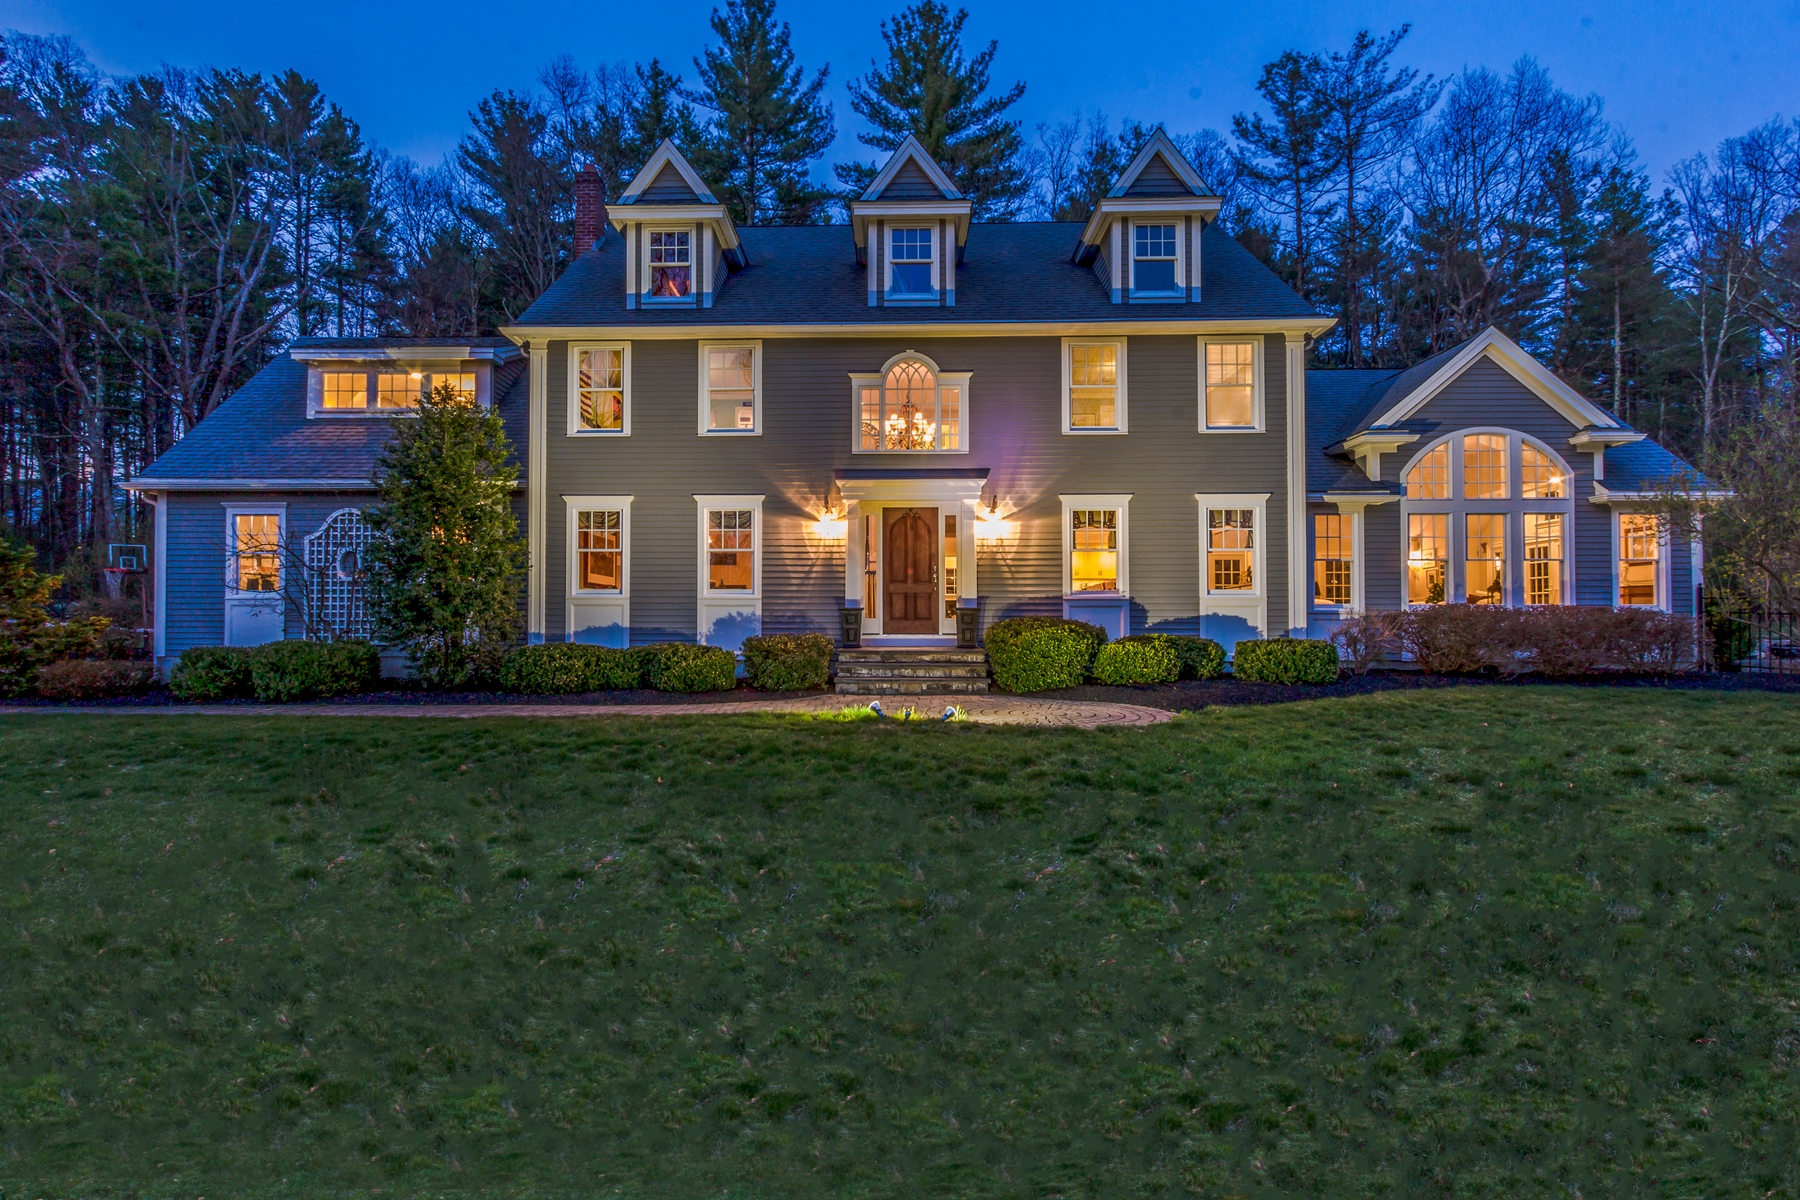 Casa Unifamiliar por un Venta en Elegant Colonial on Private Lot 14 Plumbley Road Upton, Massachusetts, 01568 Estados Unidos